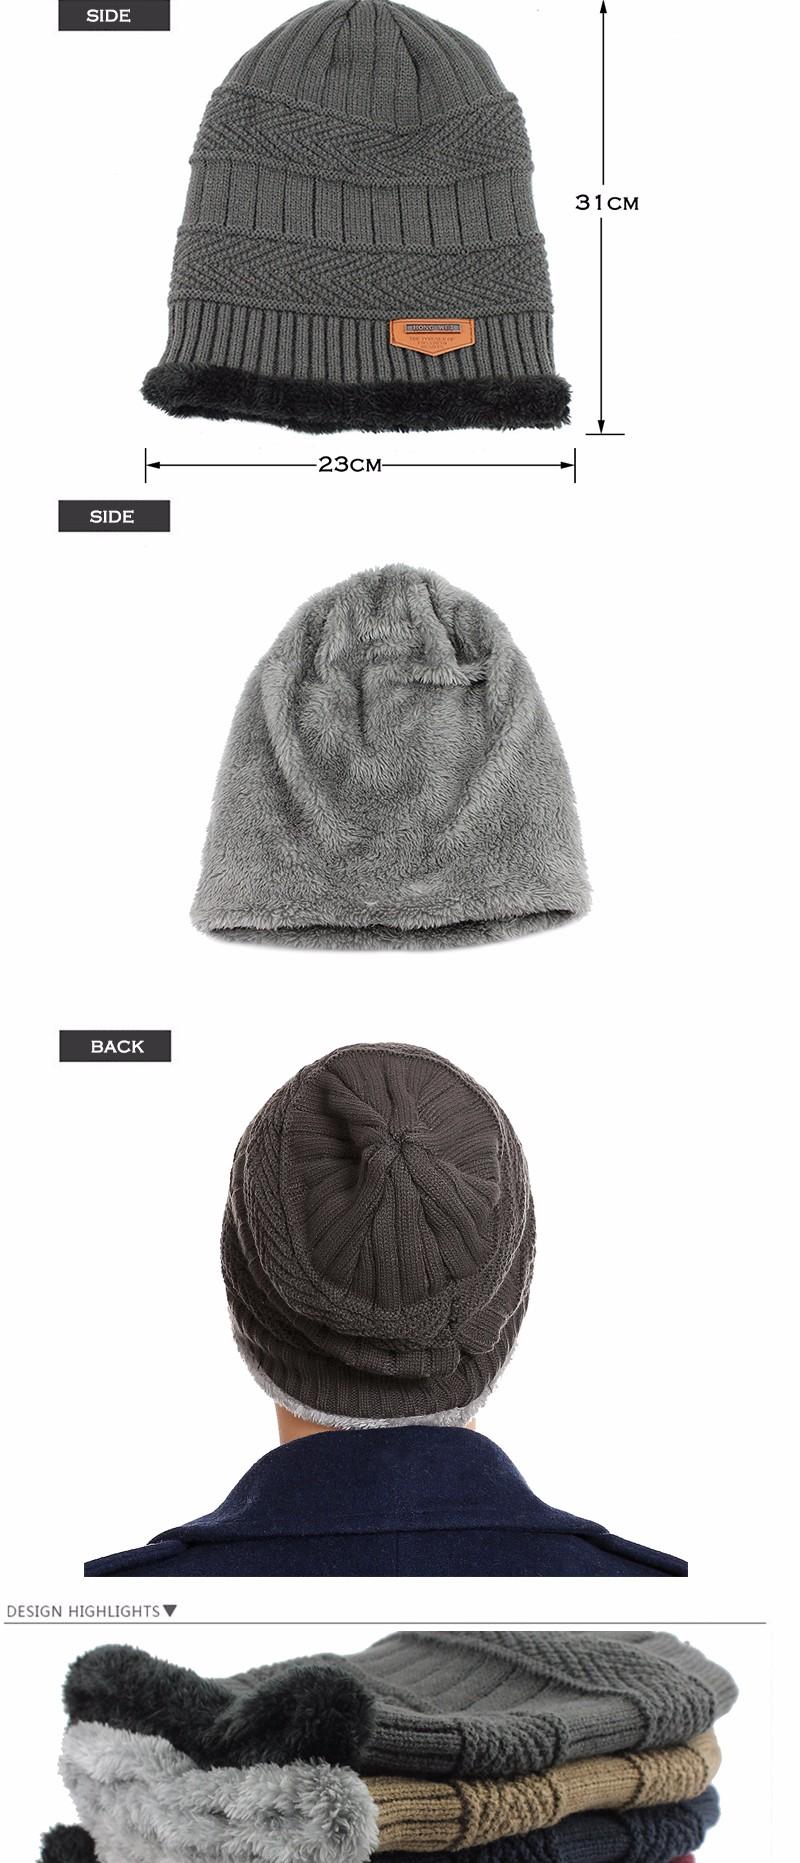 FETSBUY Pure Color Winter Skullies Beanies Hat Knit Winter Hat For Man Warm Hat Velvet Cap Bonnet Toucas Inverno Knitted Hats 20